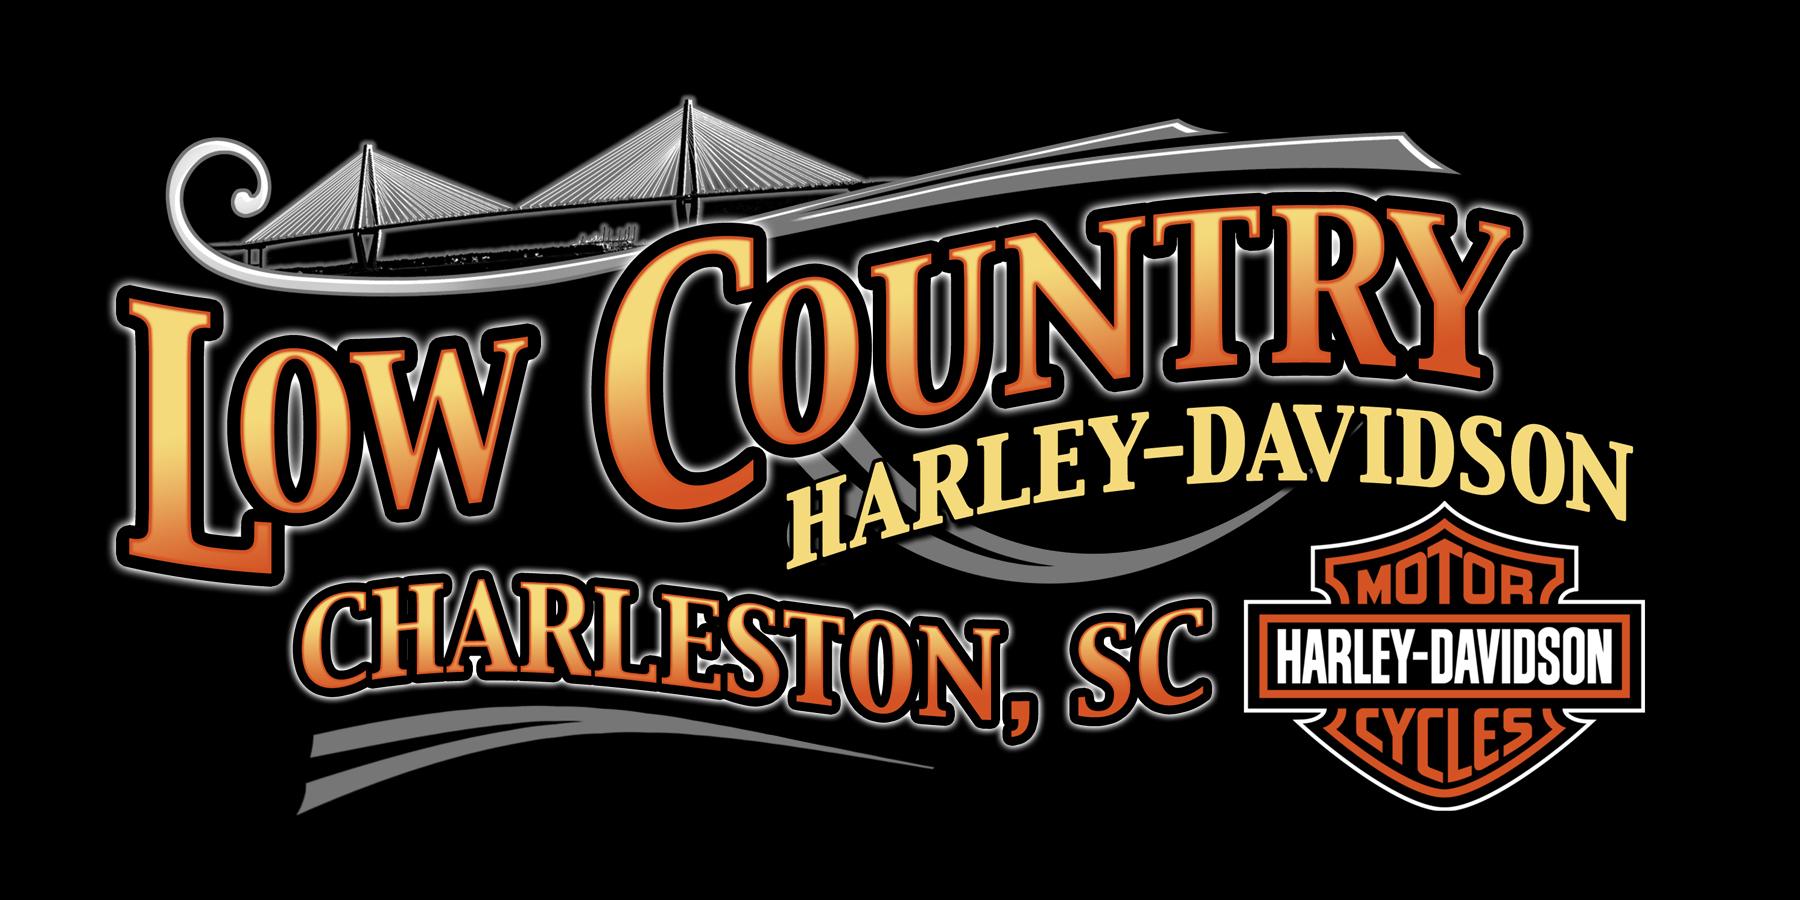 south carolina motorcycle dealer - low country harley-davidson in